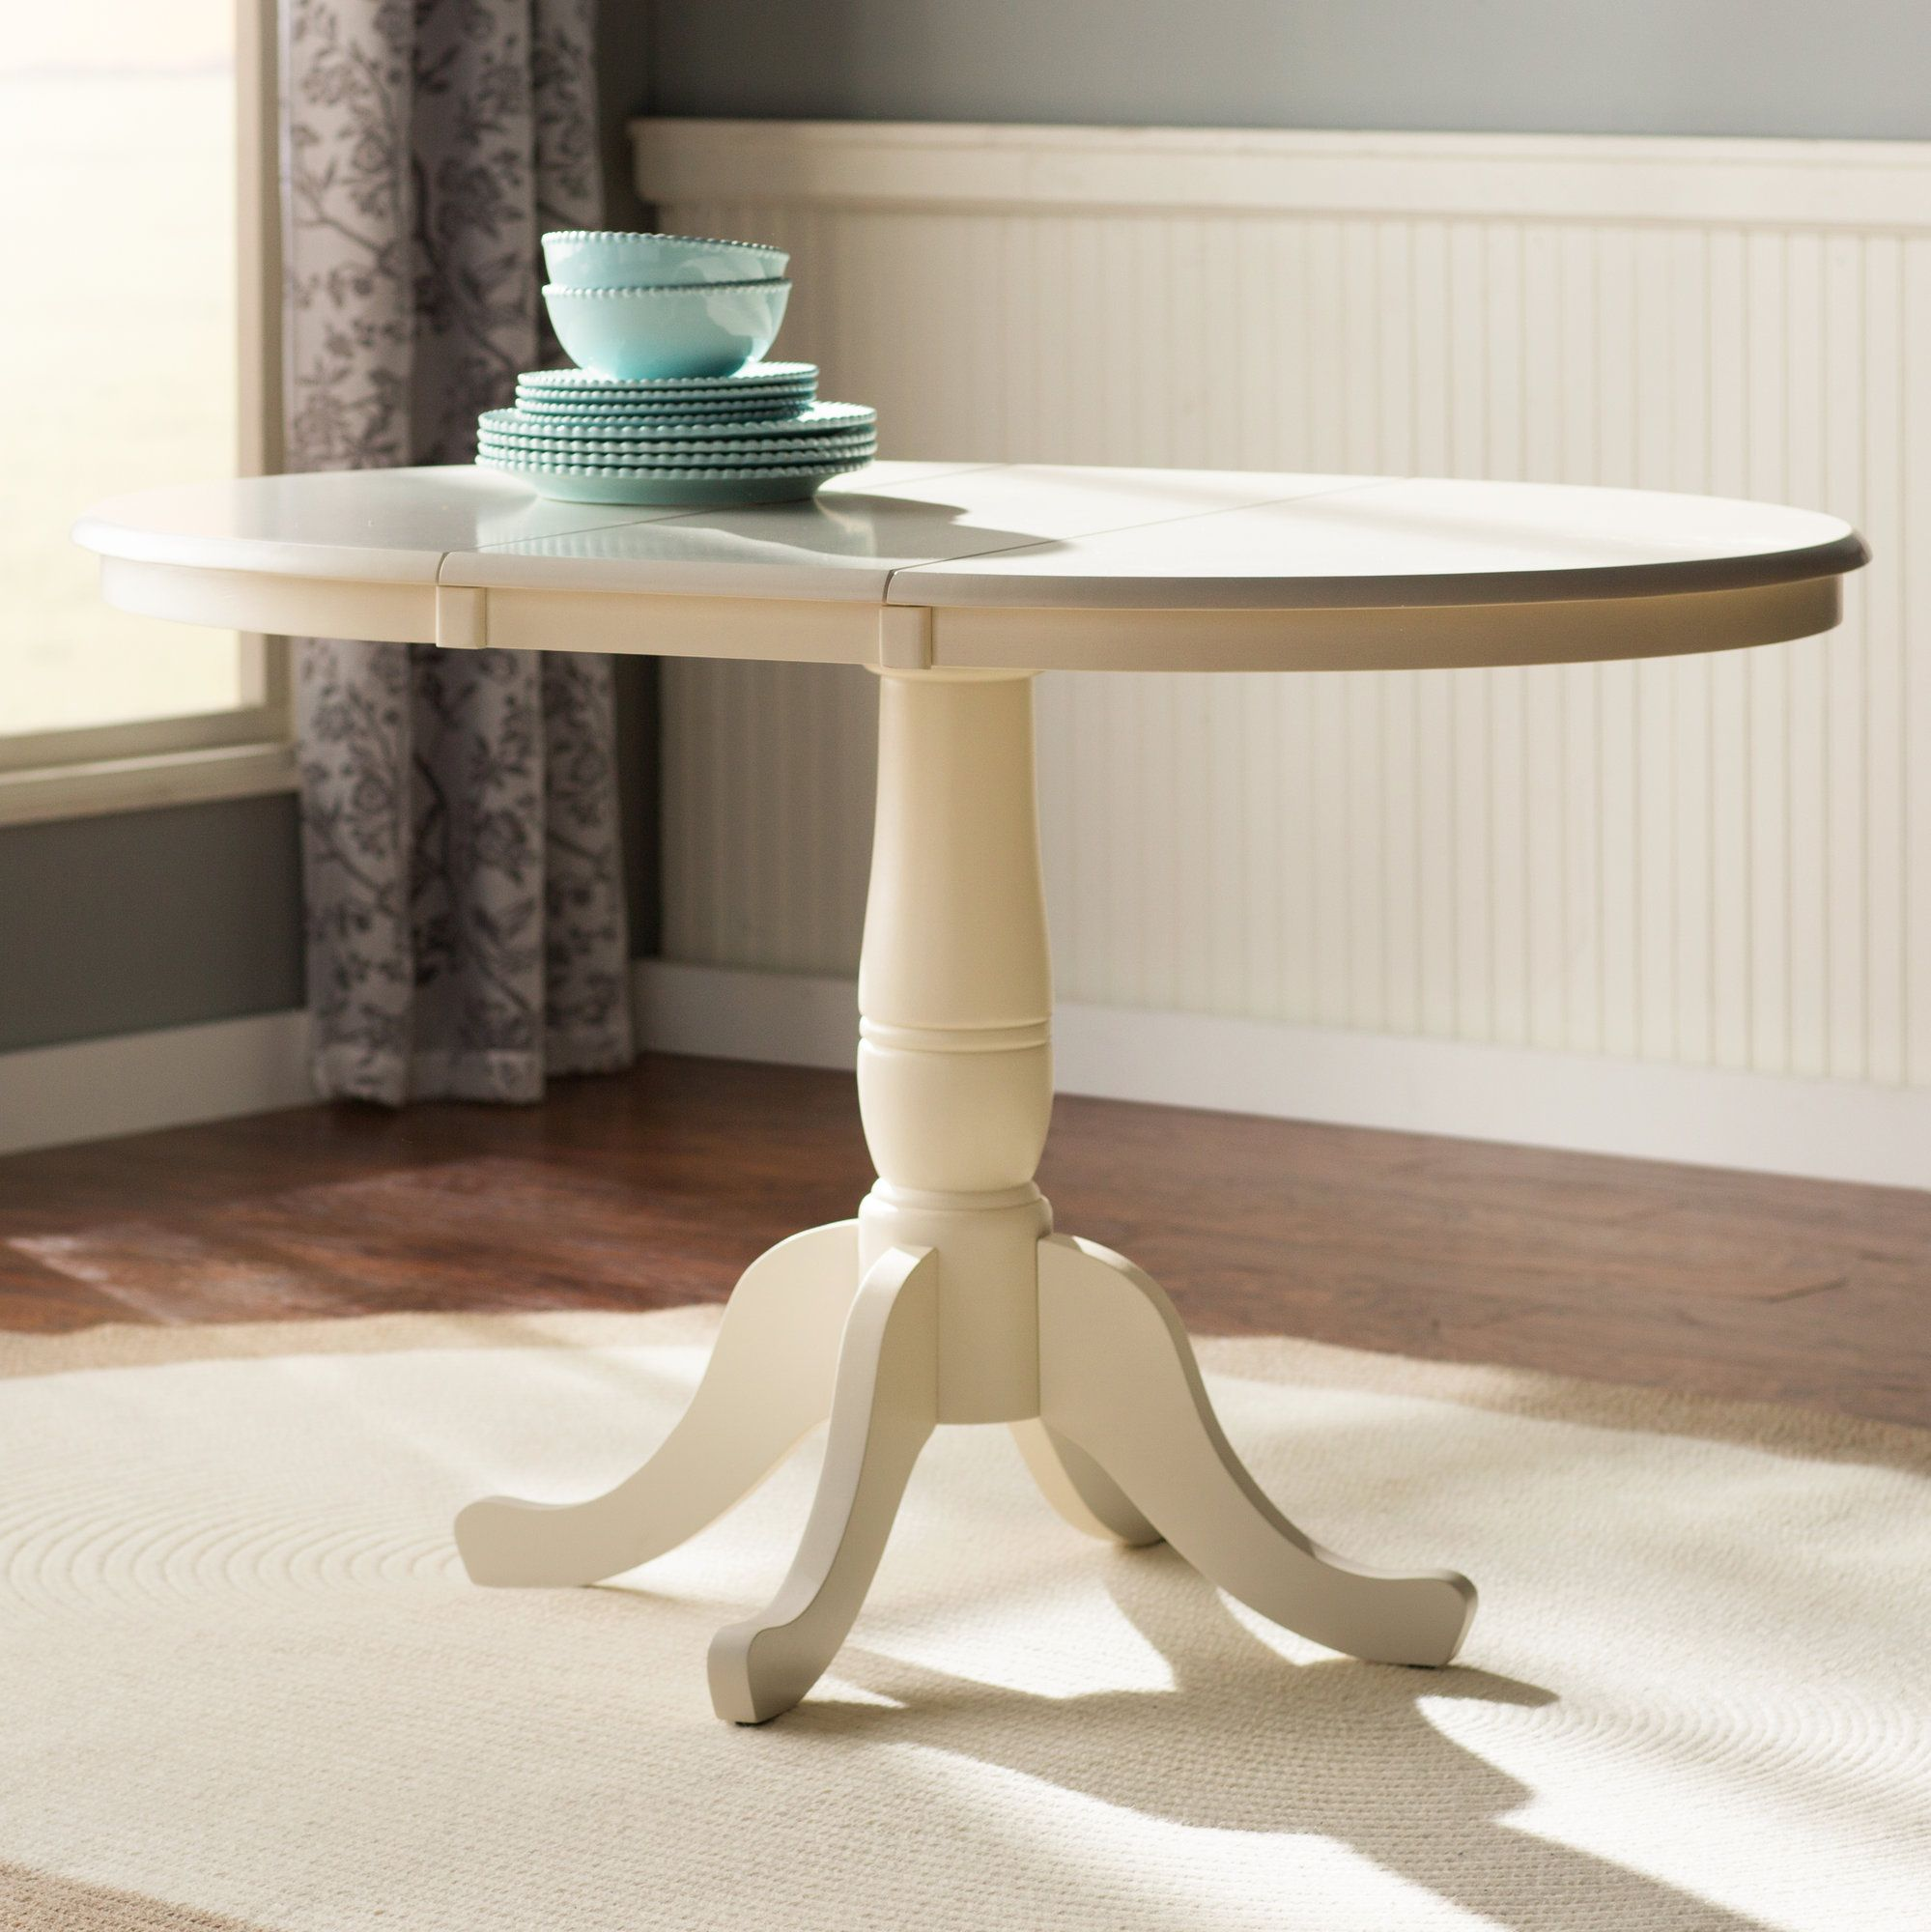 Carlisle Extendable Dining Table House Decor Pinterest - Carlisle dining table